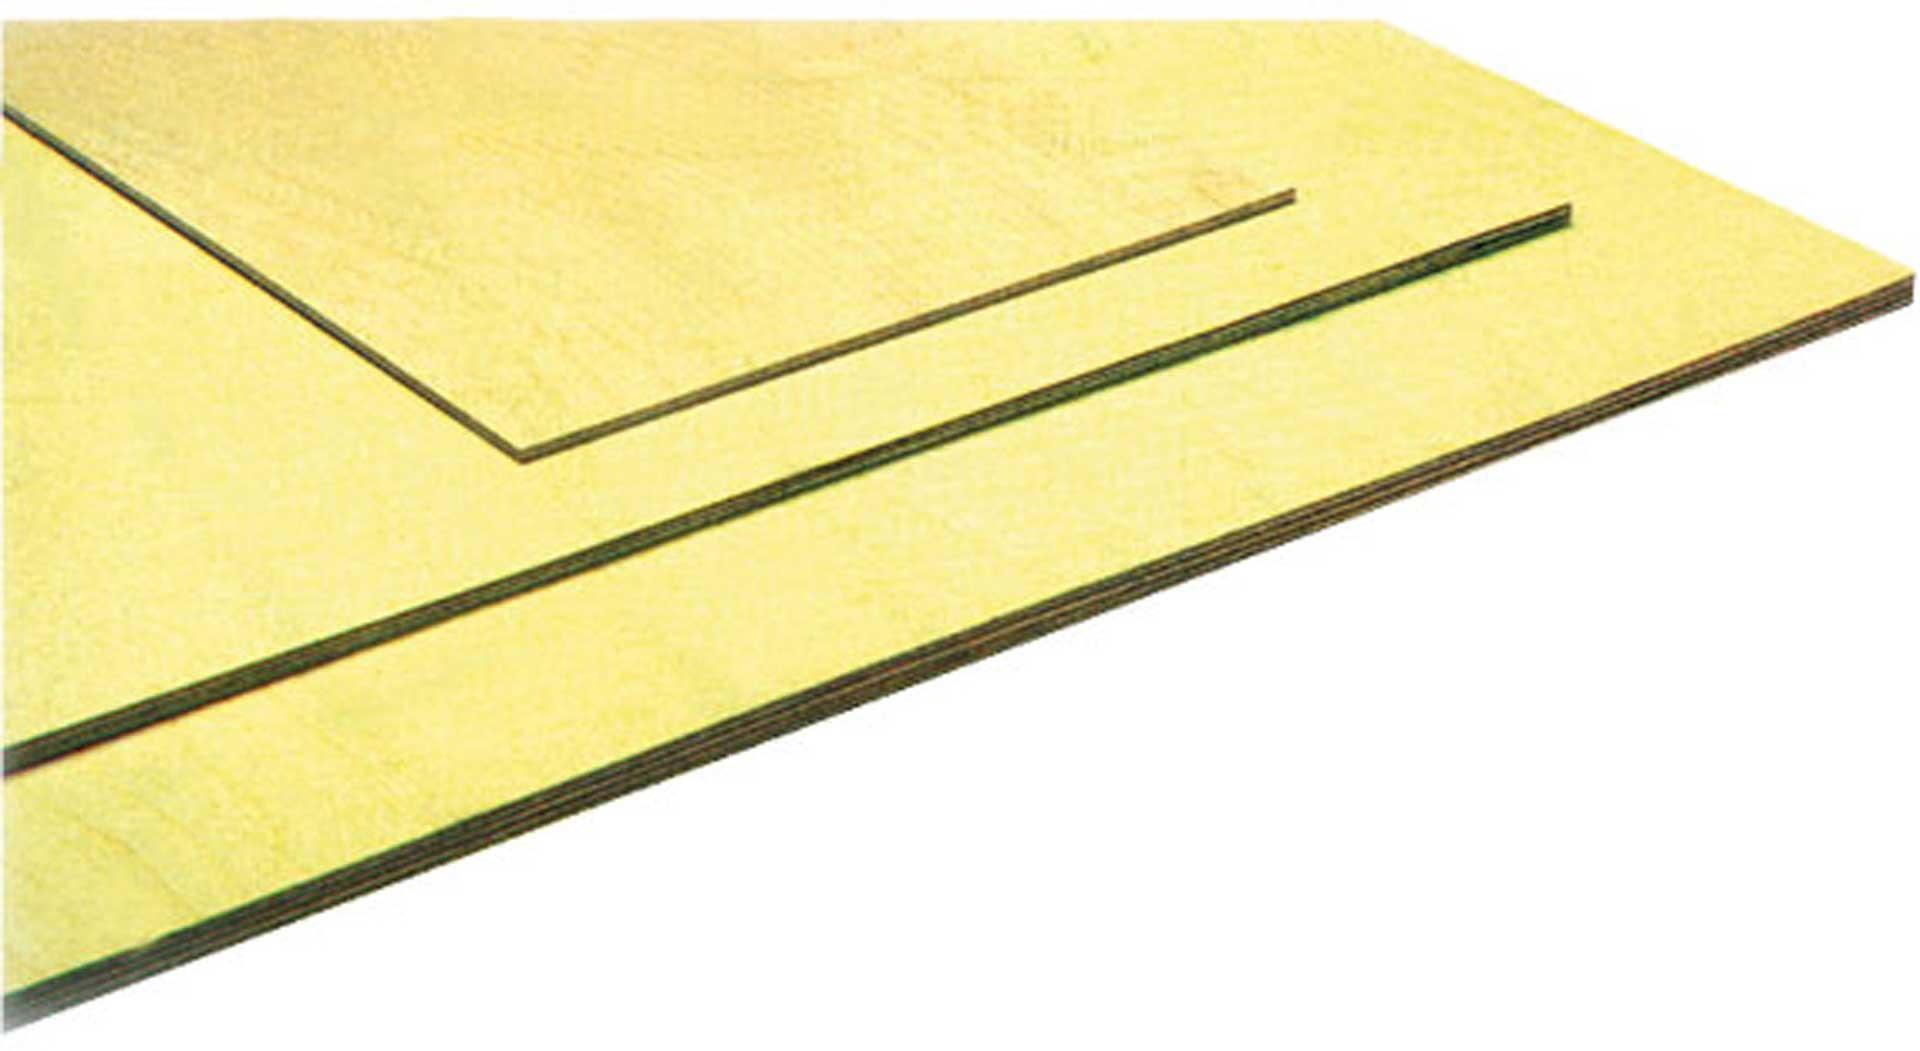 MODELLBAU LINDINGER BIRCH-WOOD 6,0/300/500MM